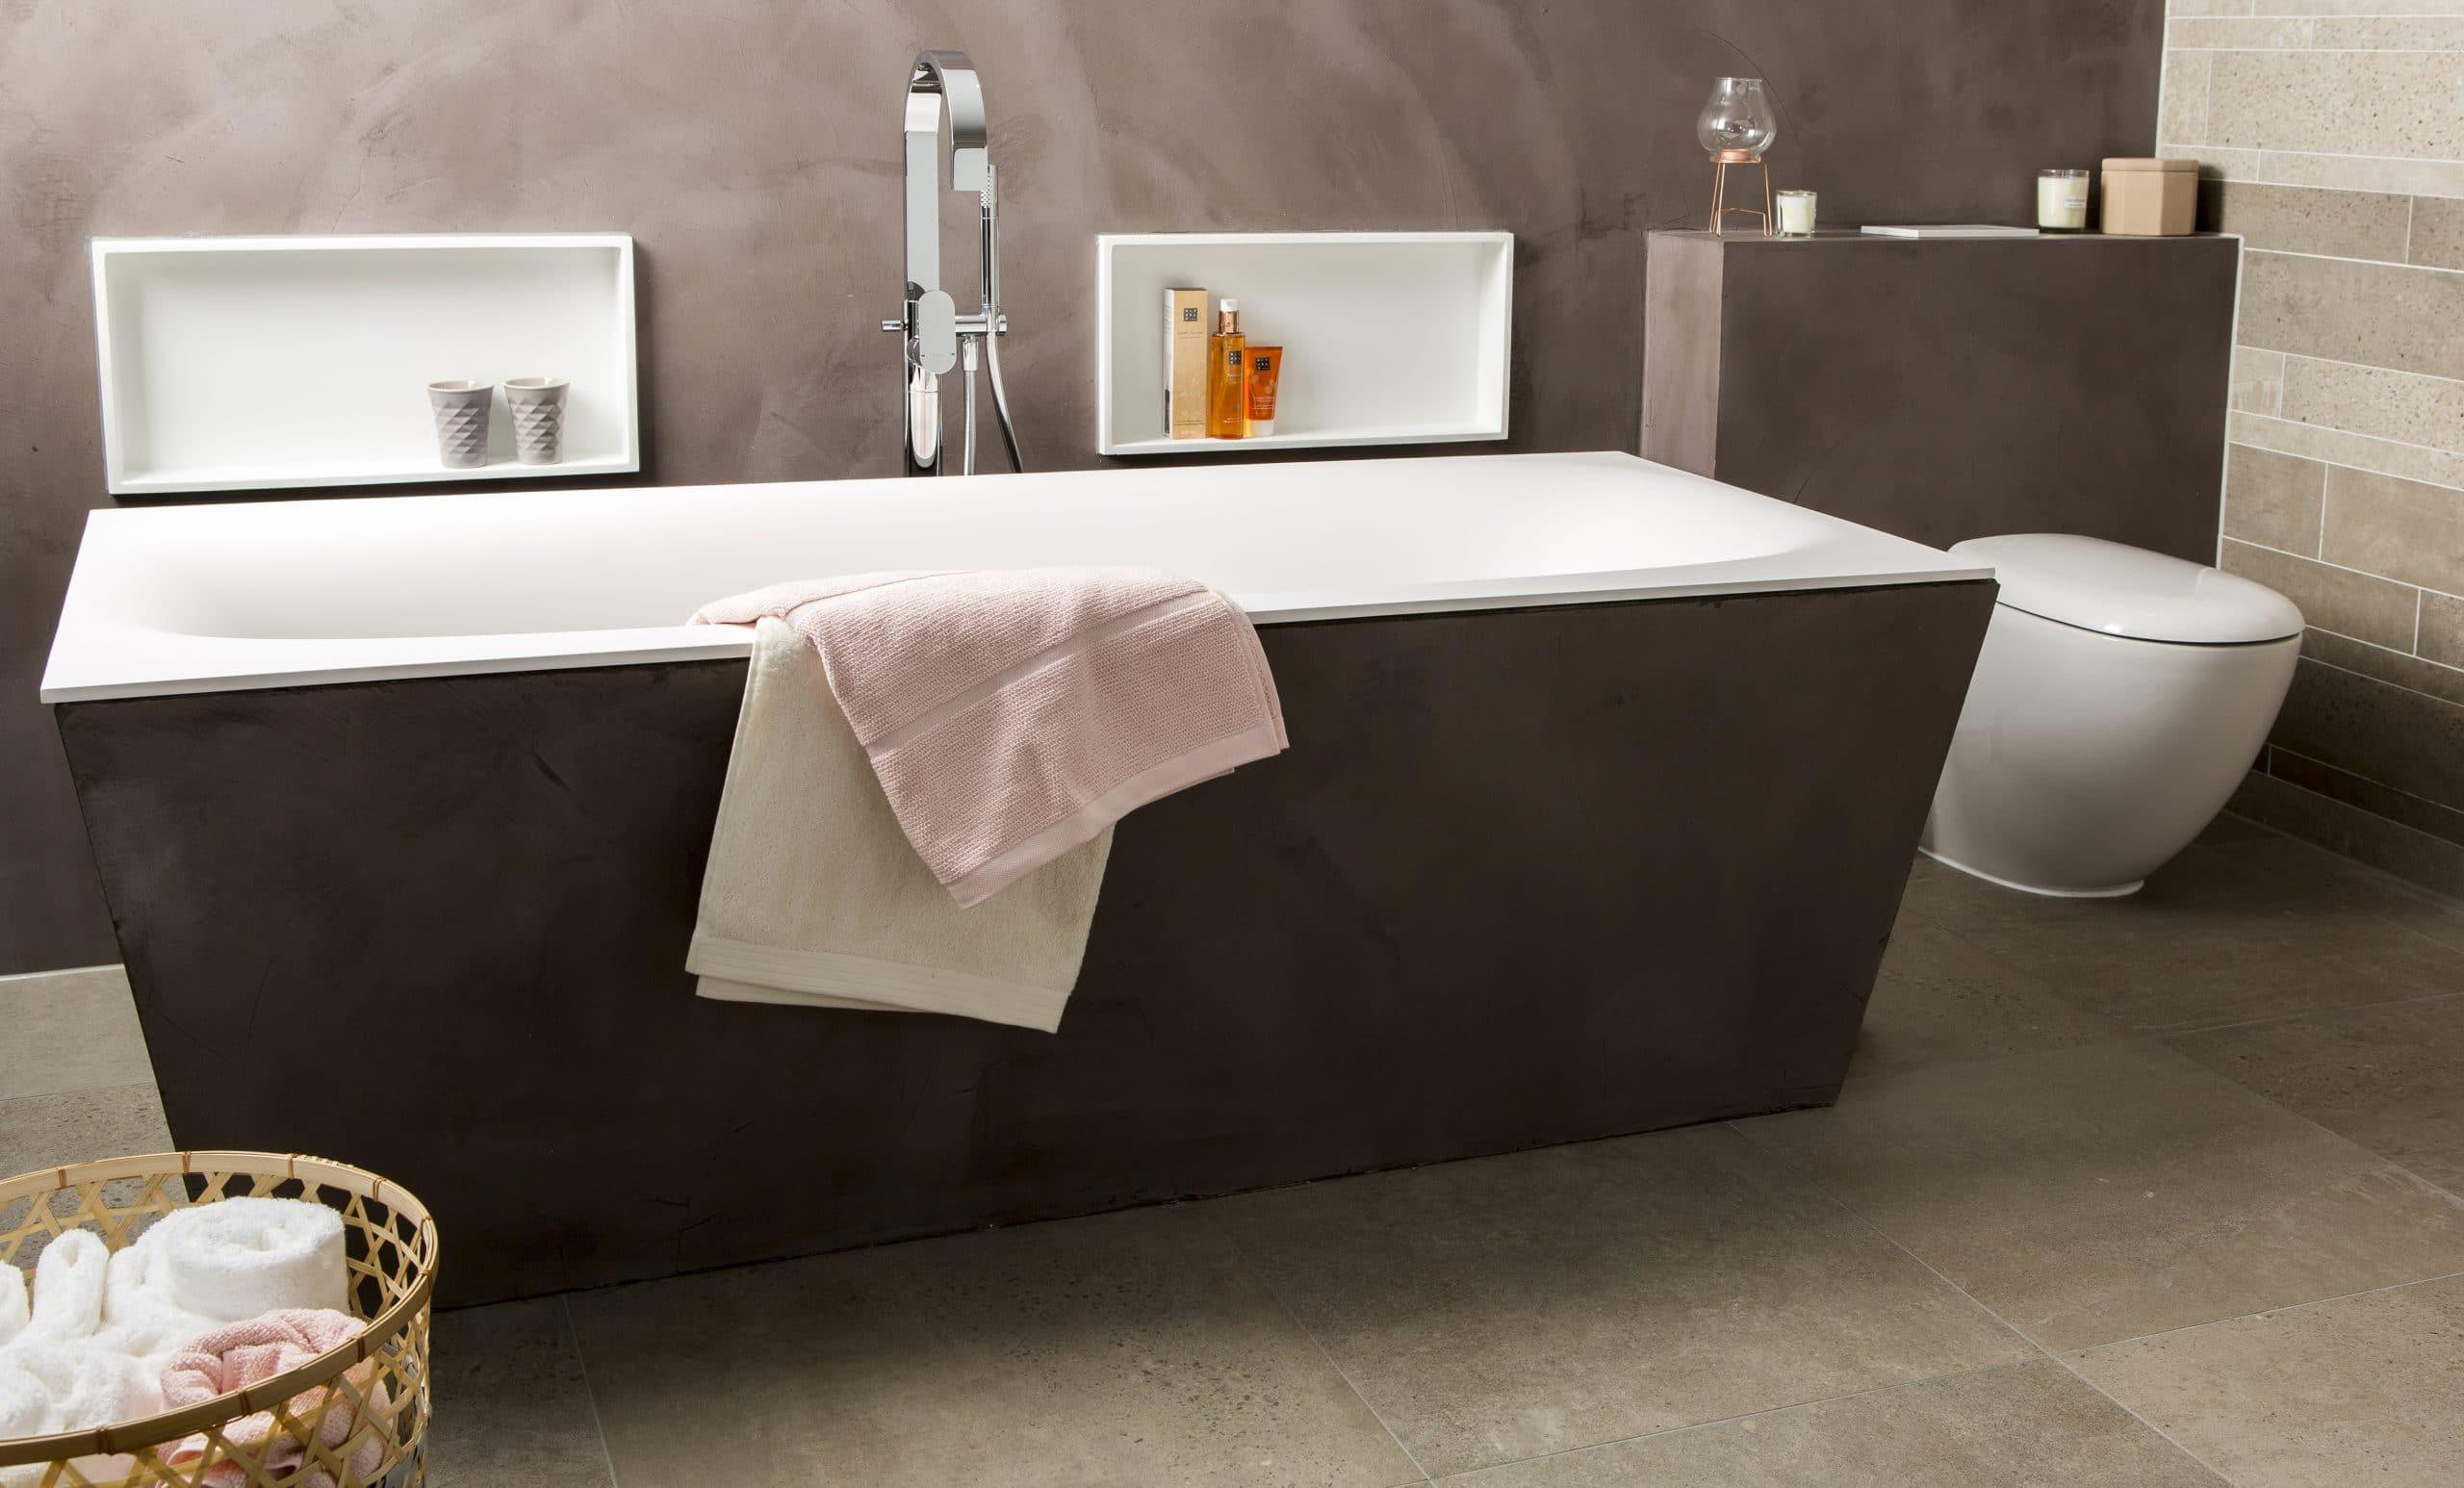 Grote Frisse Badkamer : Badkamers van manen woon thema centrum